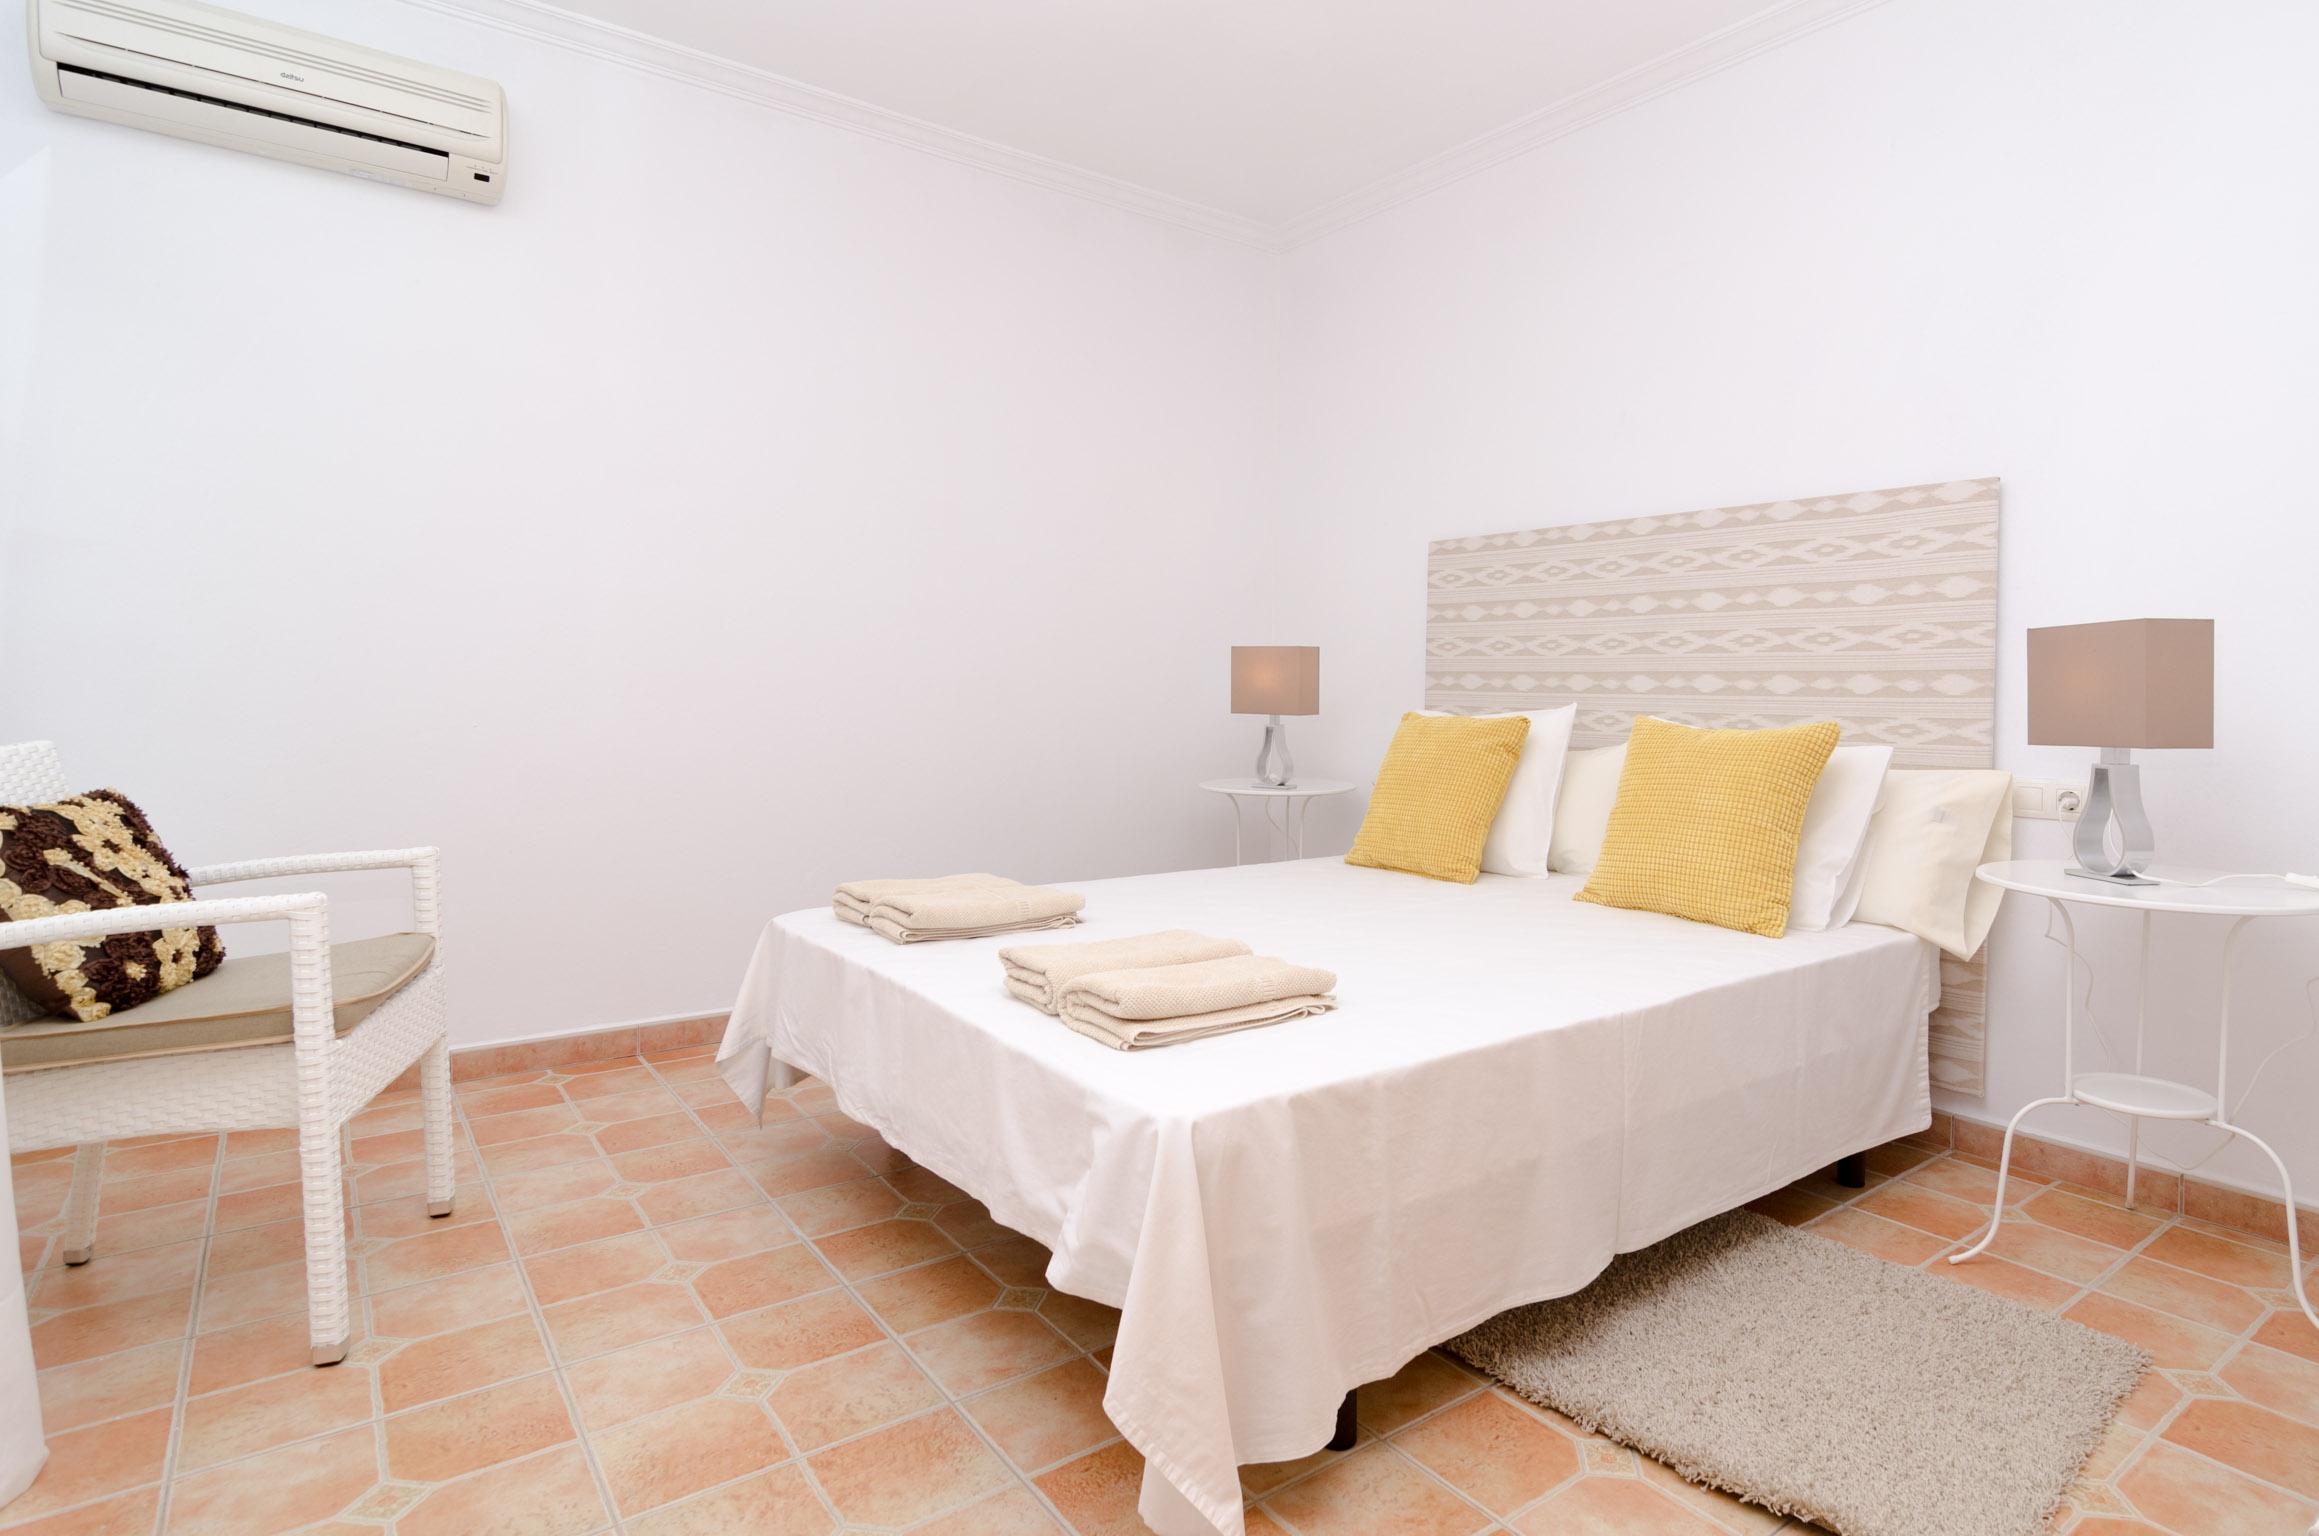 Ferienhaus SANT BLAI VELL (2284789), Campos, Mallorca, Balearische Inseln, Spanien, Bild 20